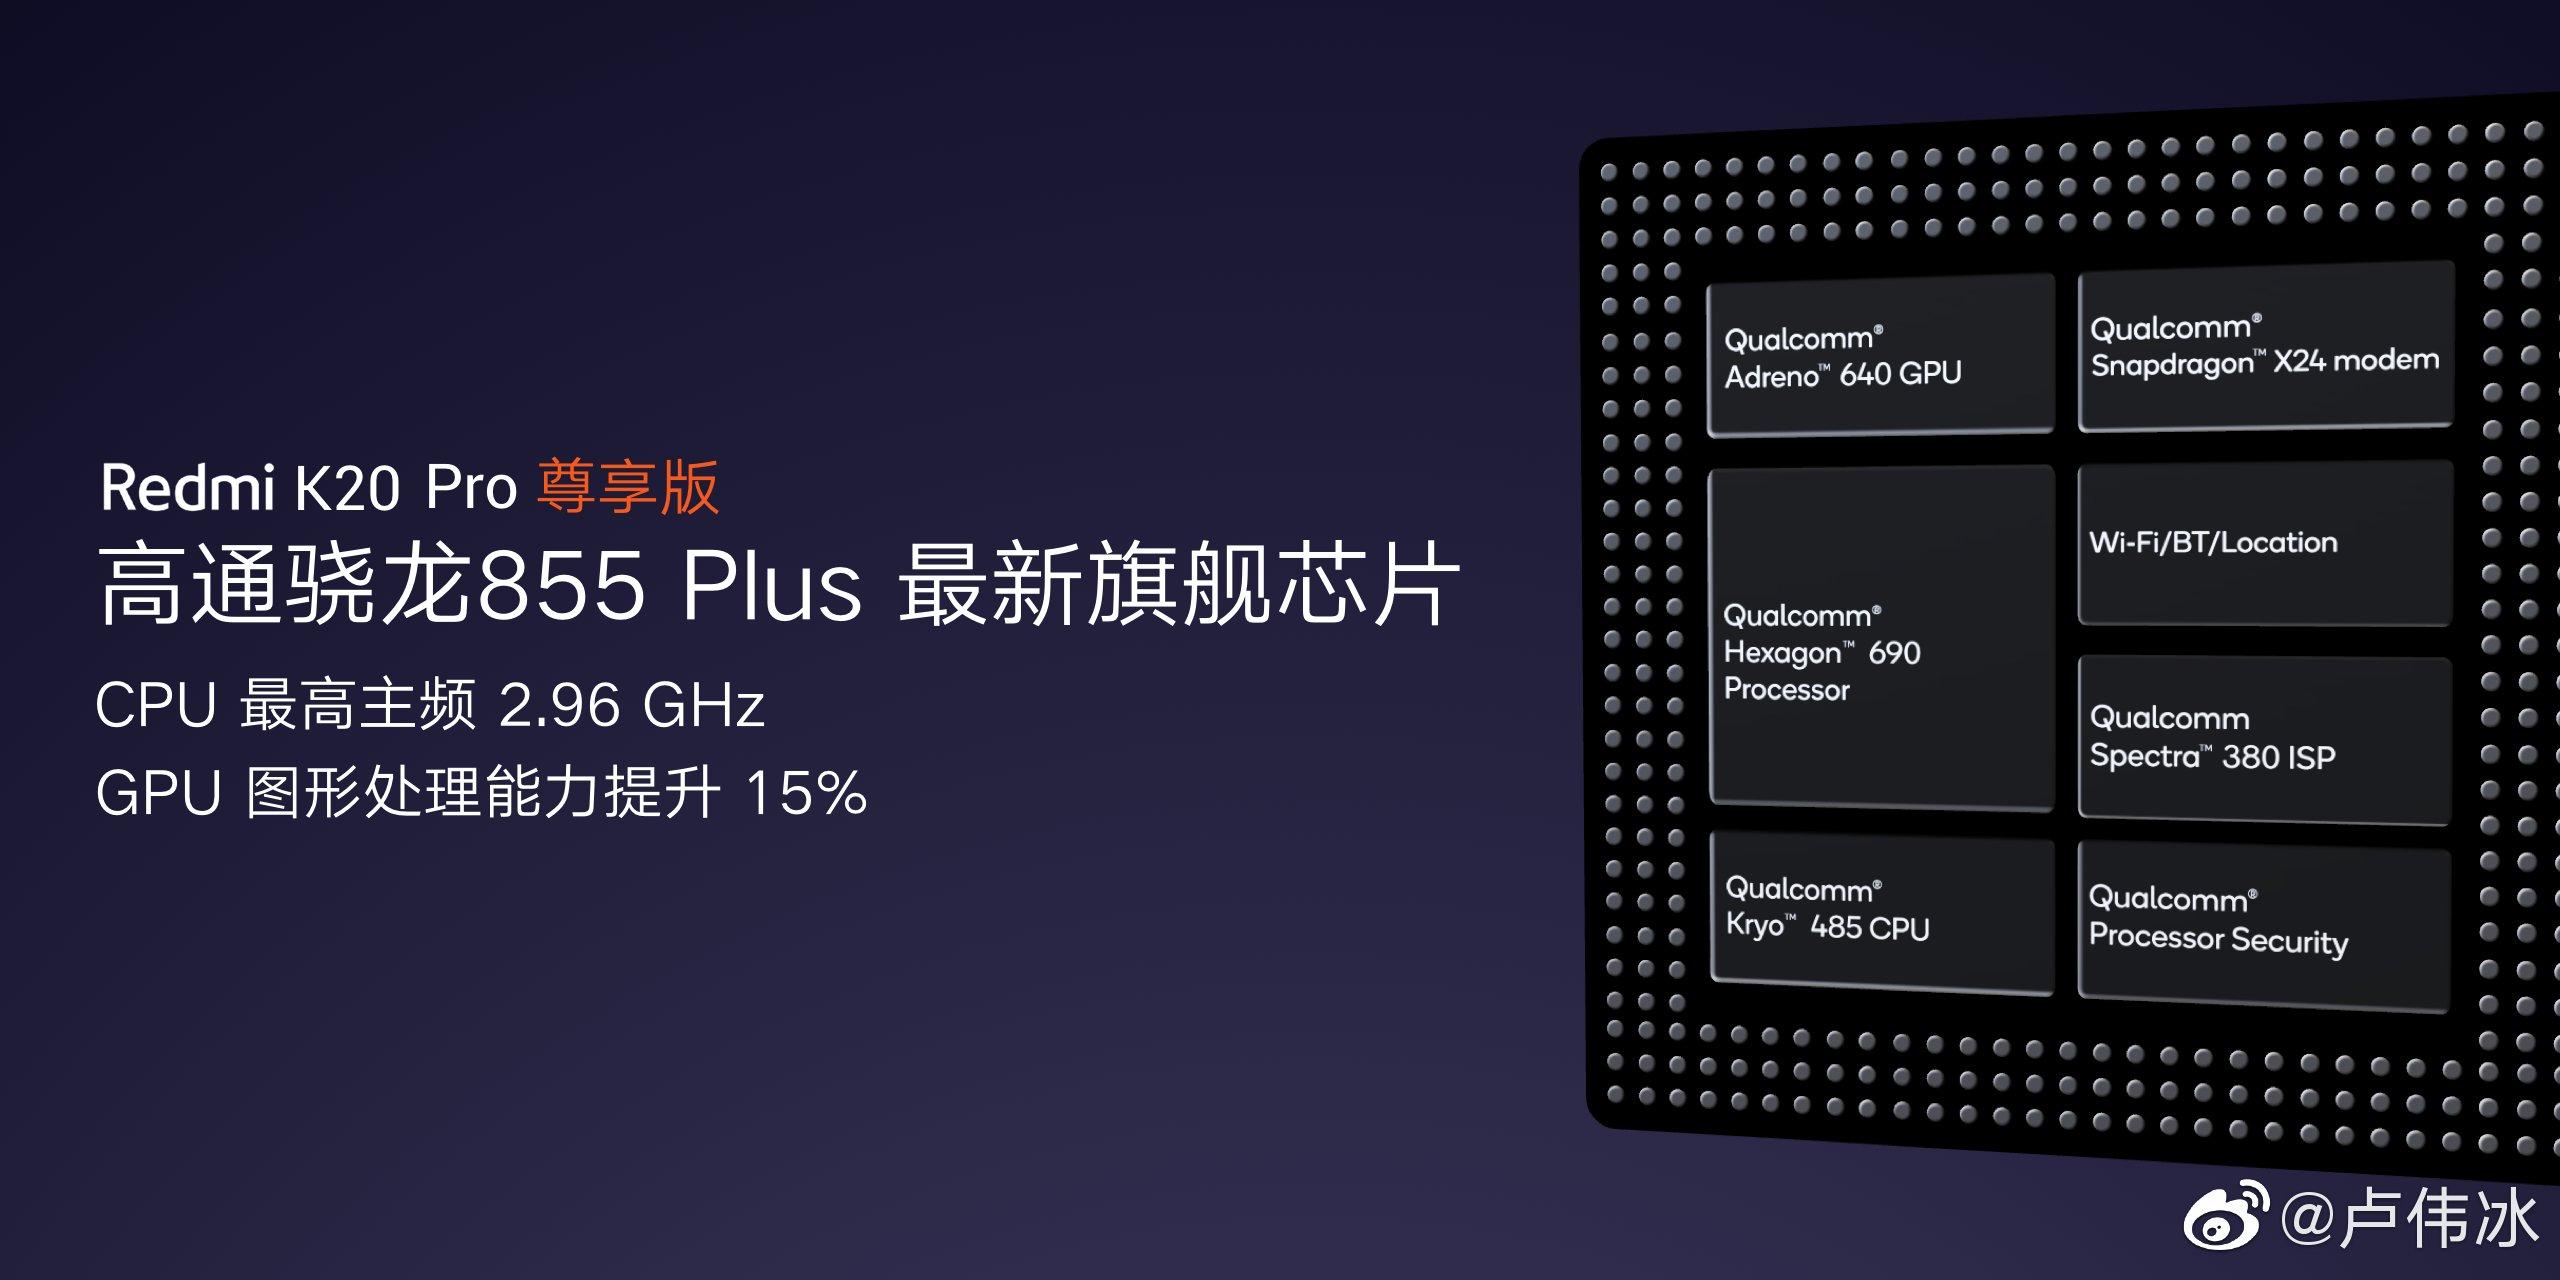 Redmi K20 Pro Exclusive Edition 2